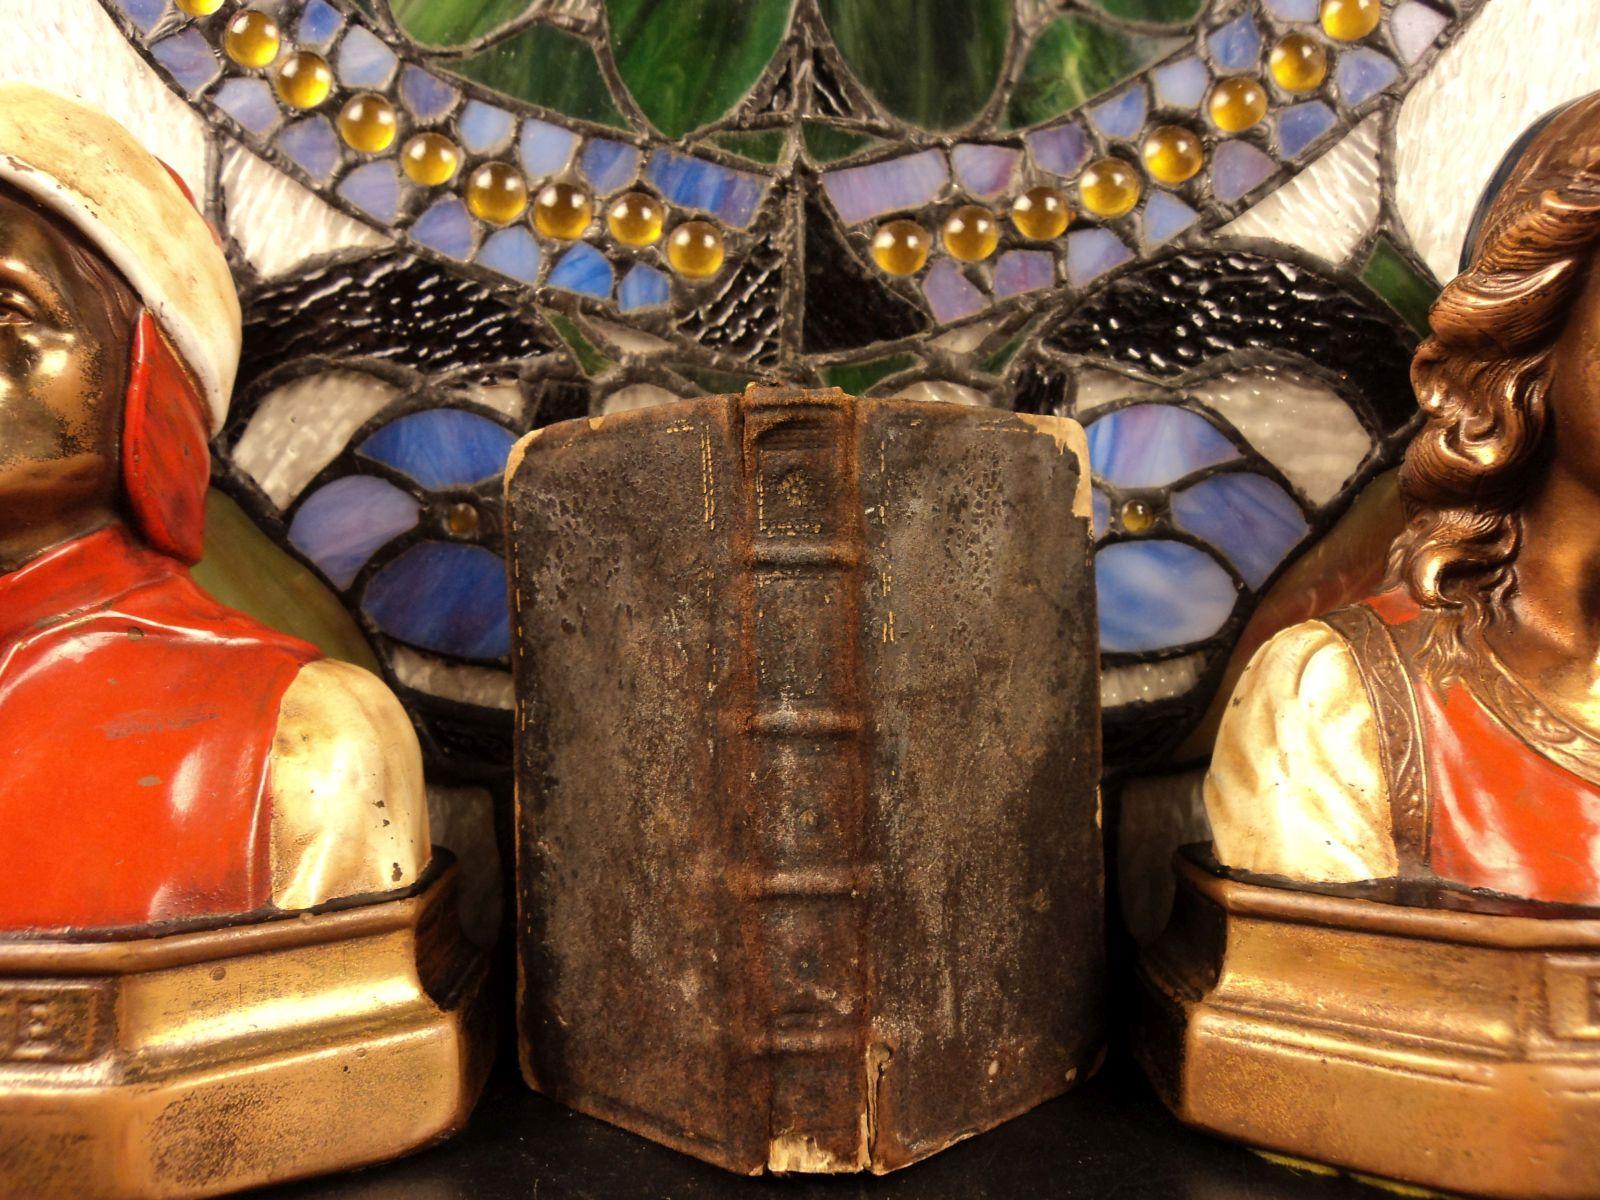 1640 NOAH Building the Ark Old Testament BIBLE Global ...